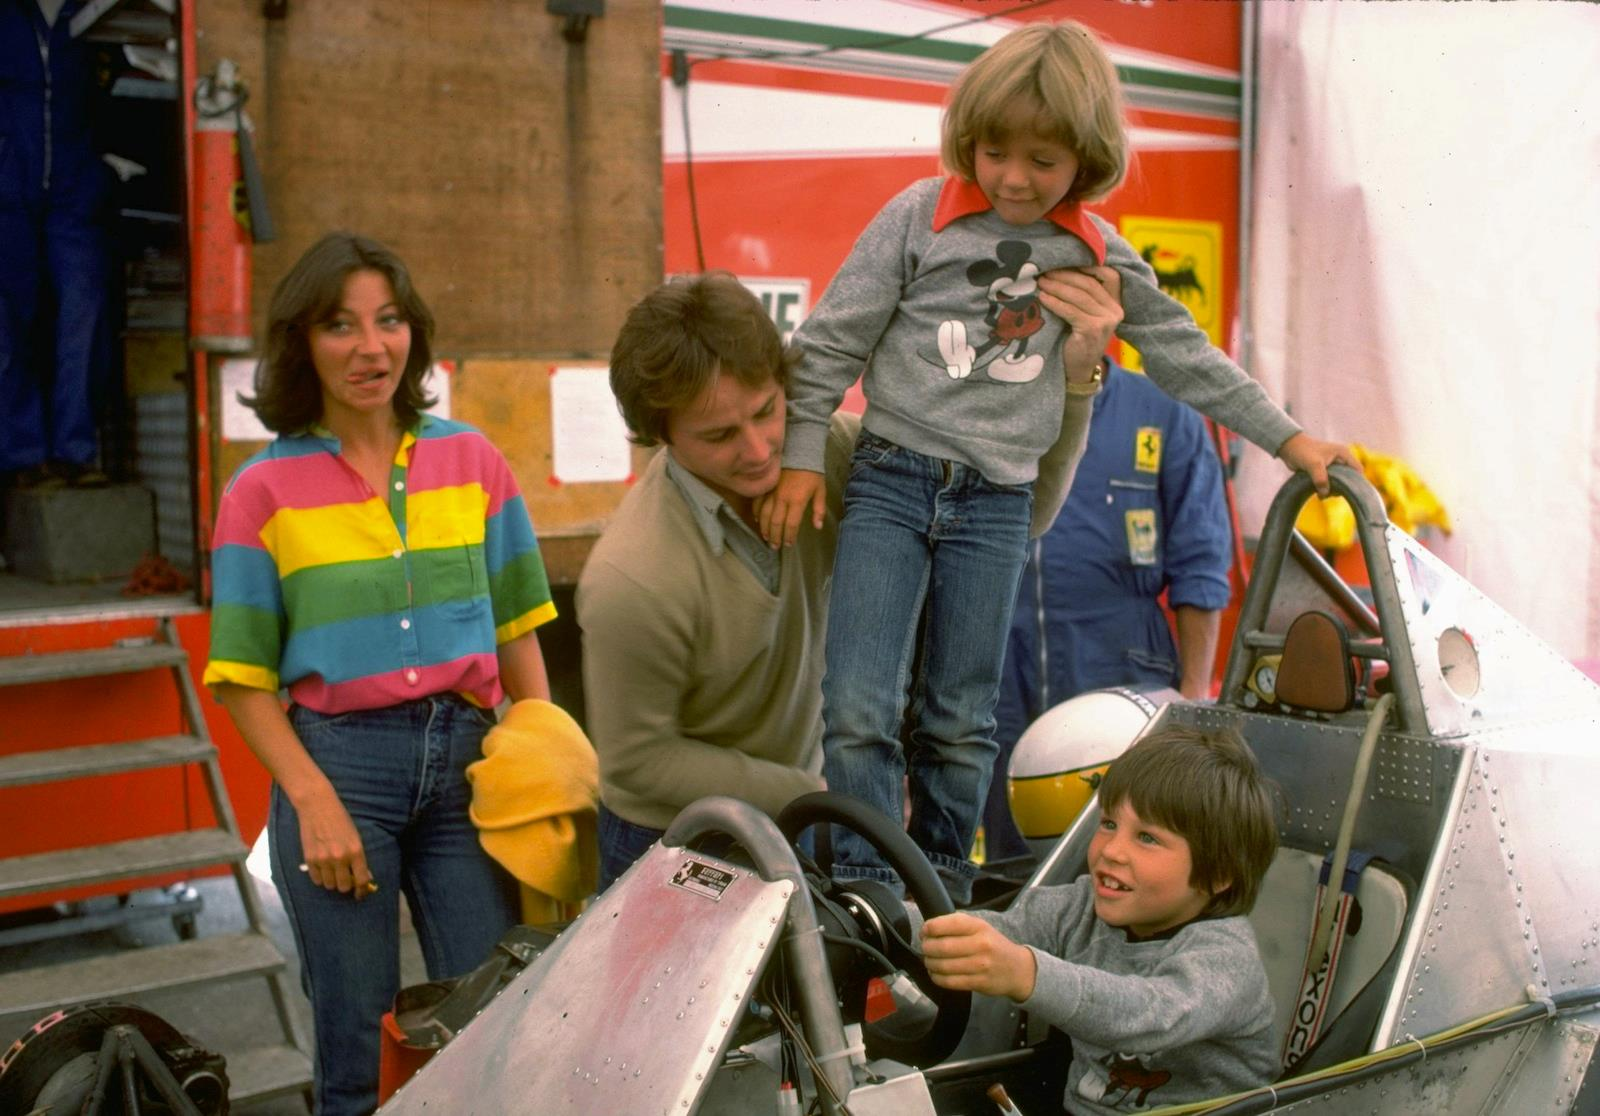 1979 - Canada - Villeneuve Famly (Joann, Gilles, Melanie, and Jacques ).jpg